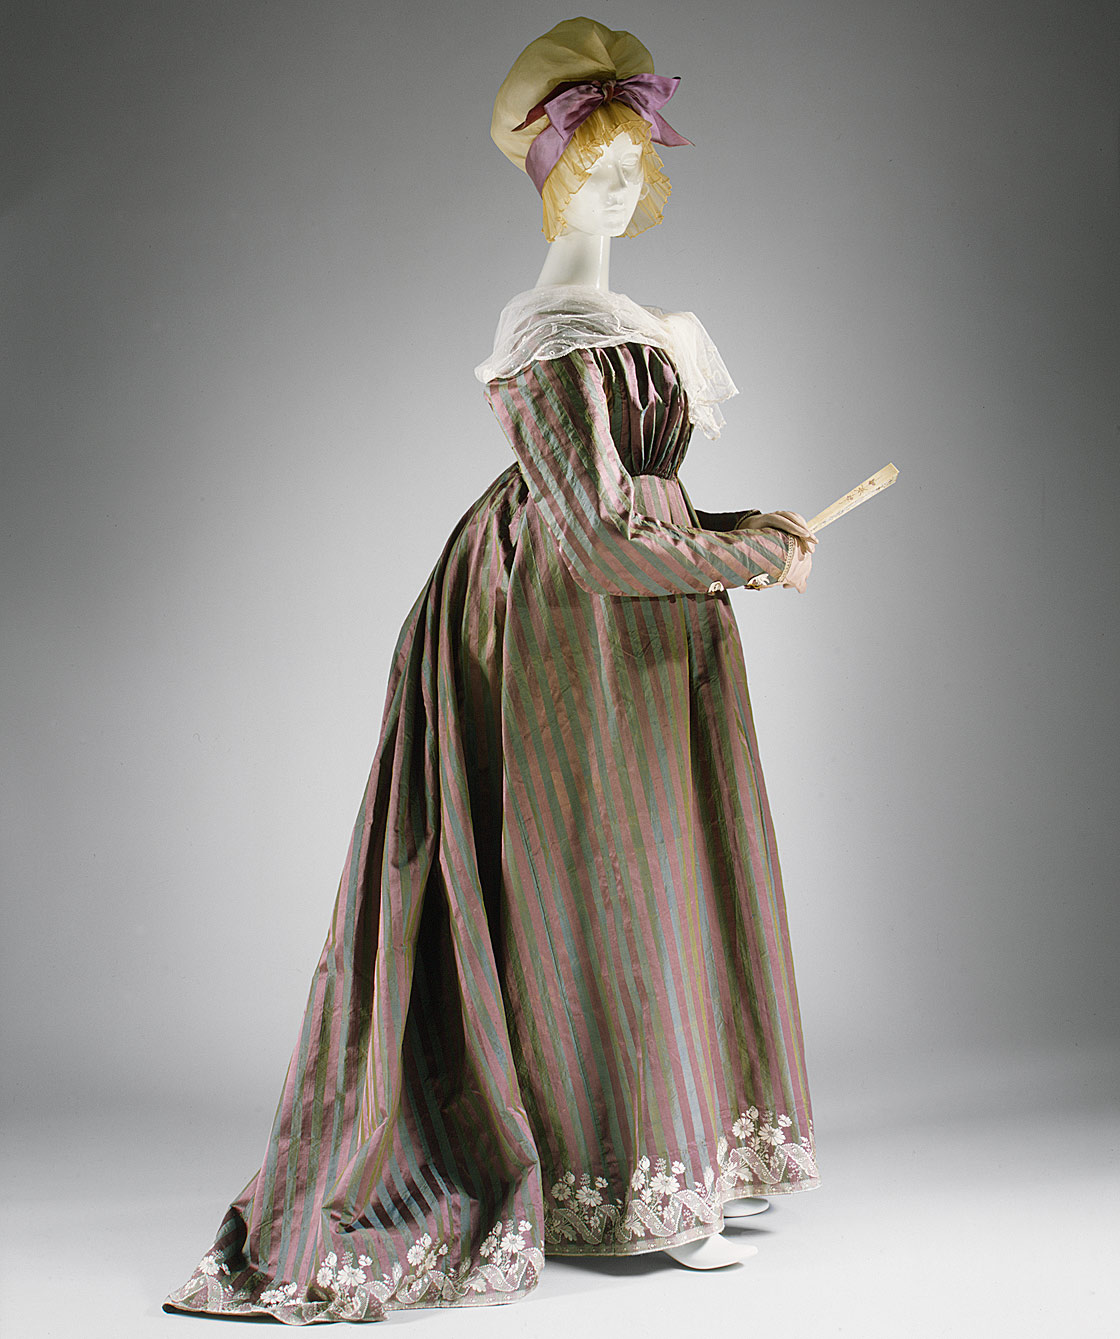 Round gown | Work of Art | Heilbrunn Timeline of Art History